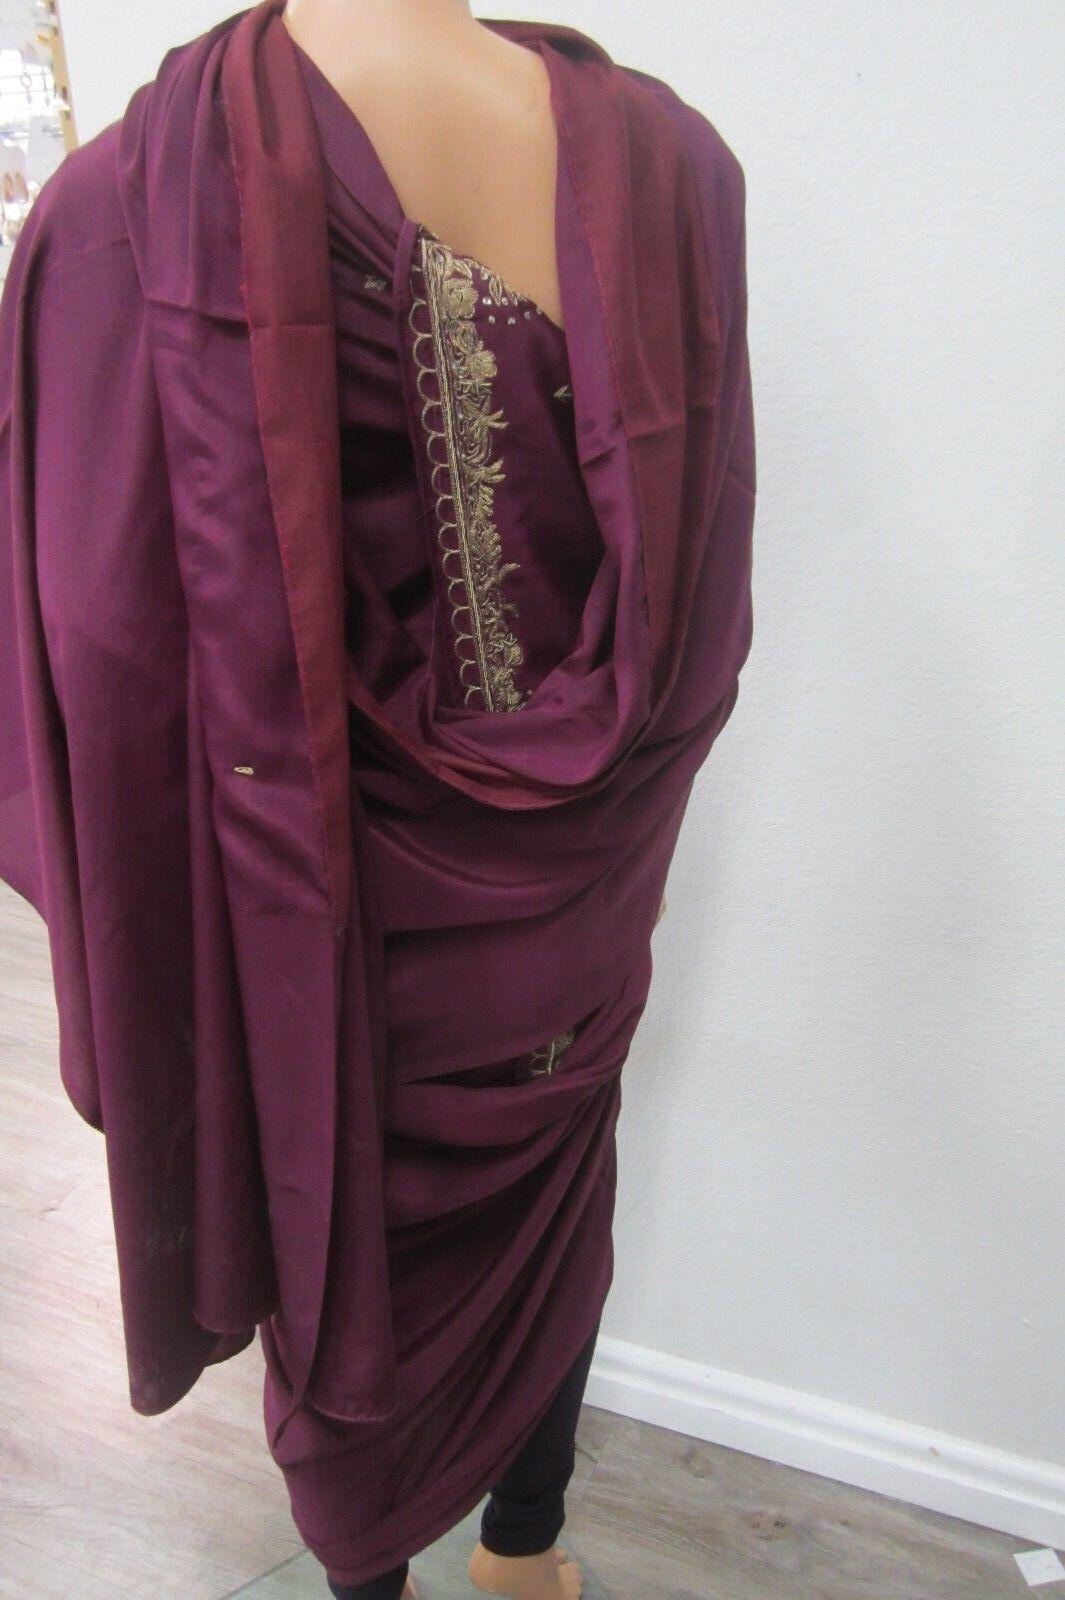 Beautiful Party Evening Dress Purple Saree Women Fashion Clothing Attire Sari